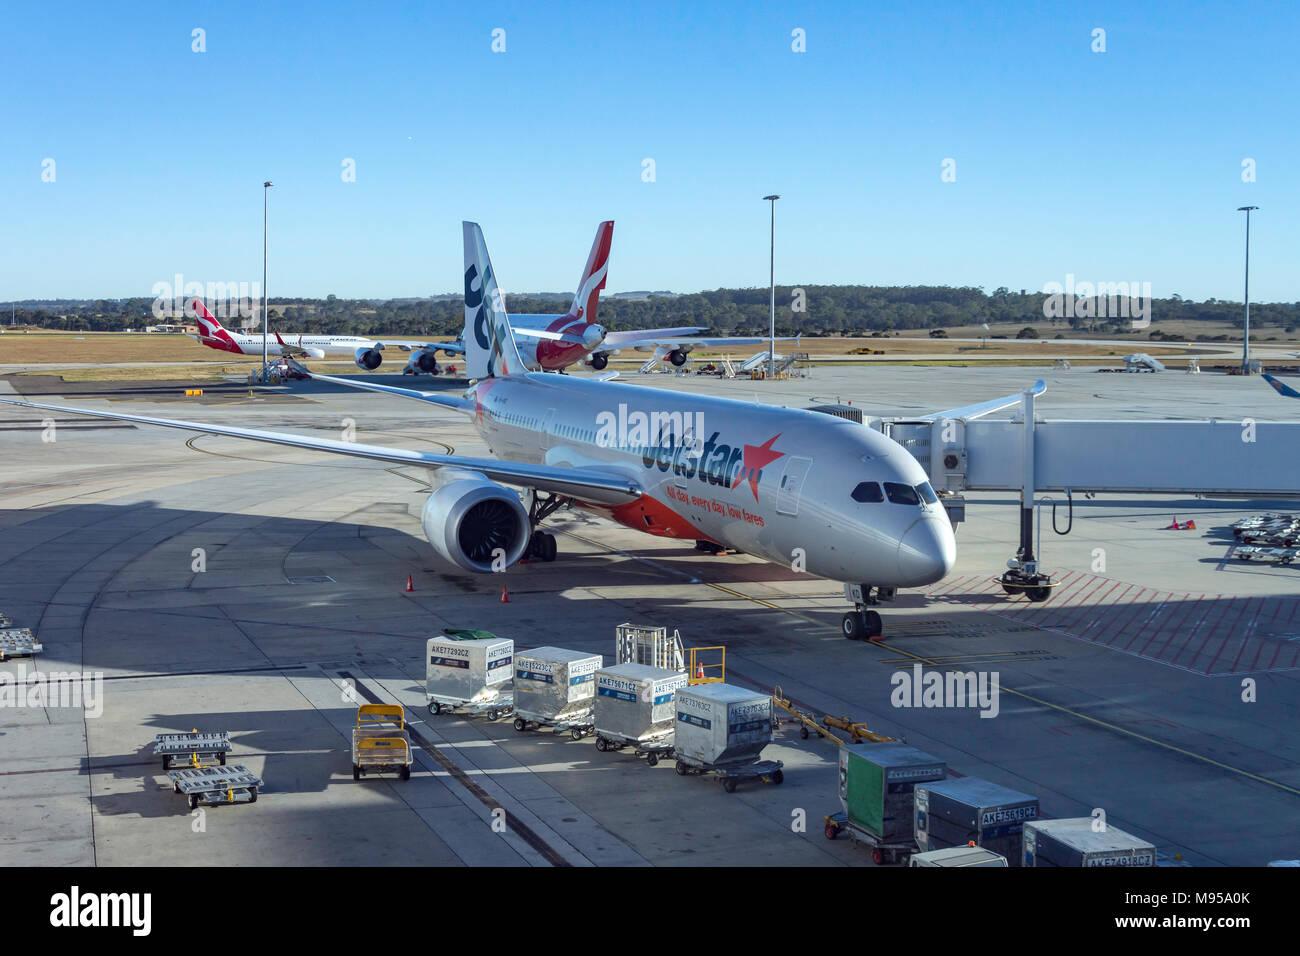 Jetstar Boeing 787-8 Dreamliner at Melbourne Tullamarine Airport, Melbourne, Victoria, Australia - Stock Image